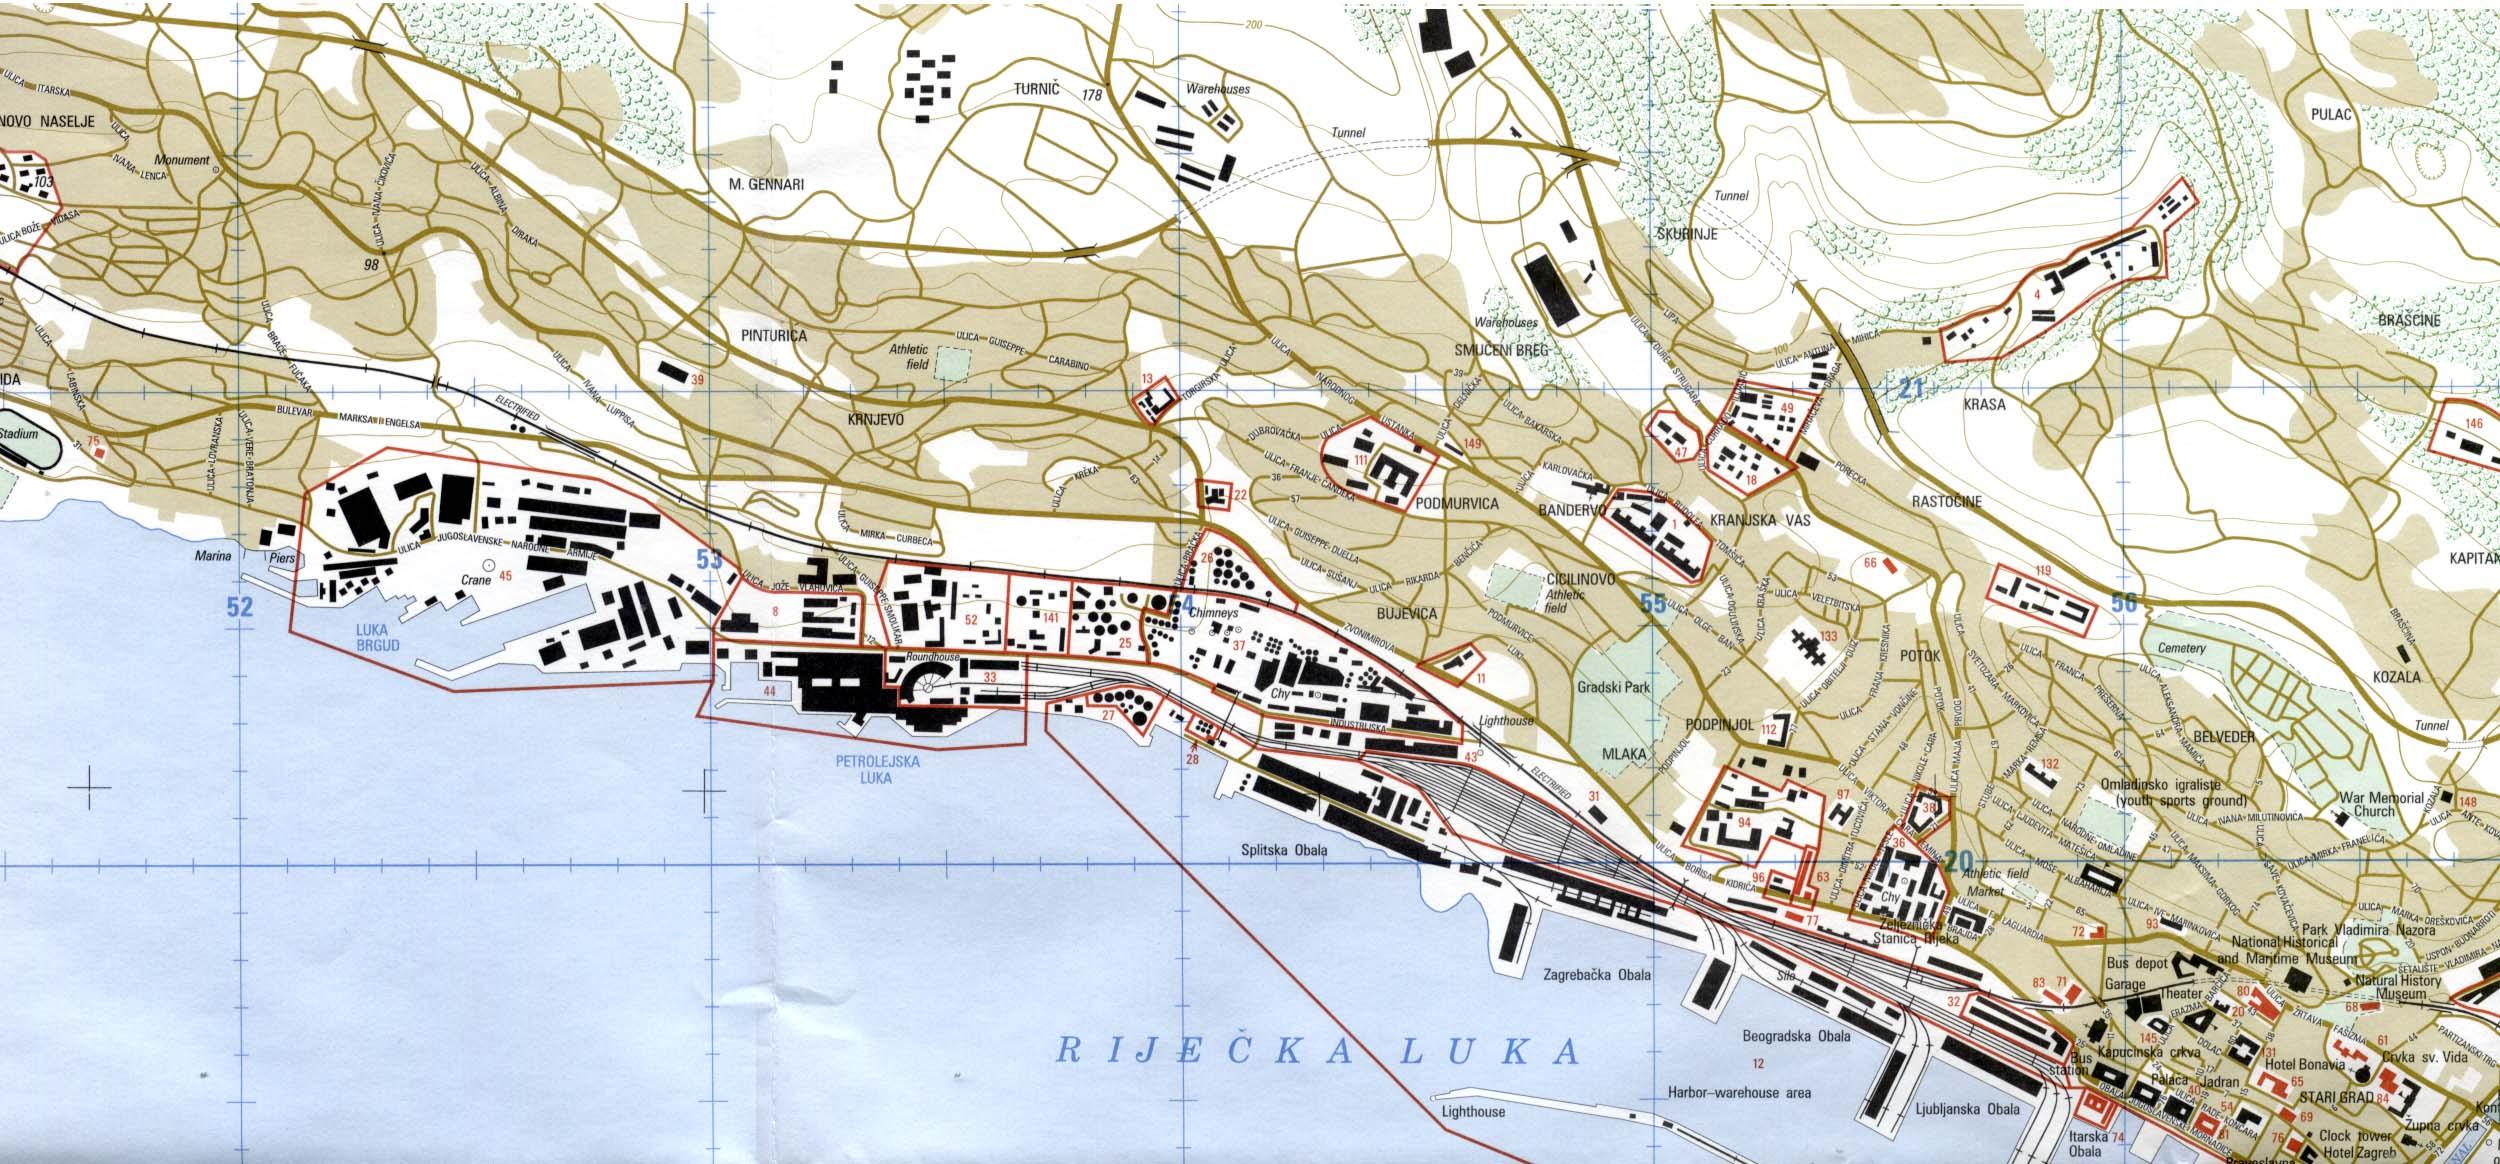 Mapa de la Ciudad de Rijeka, Croacia